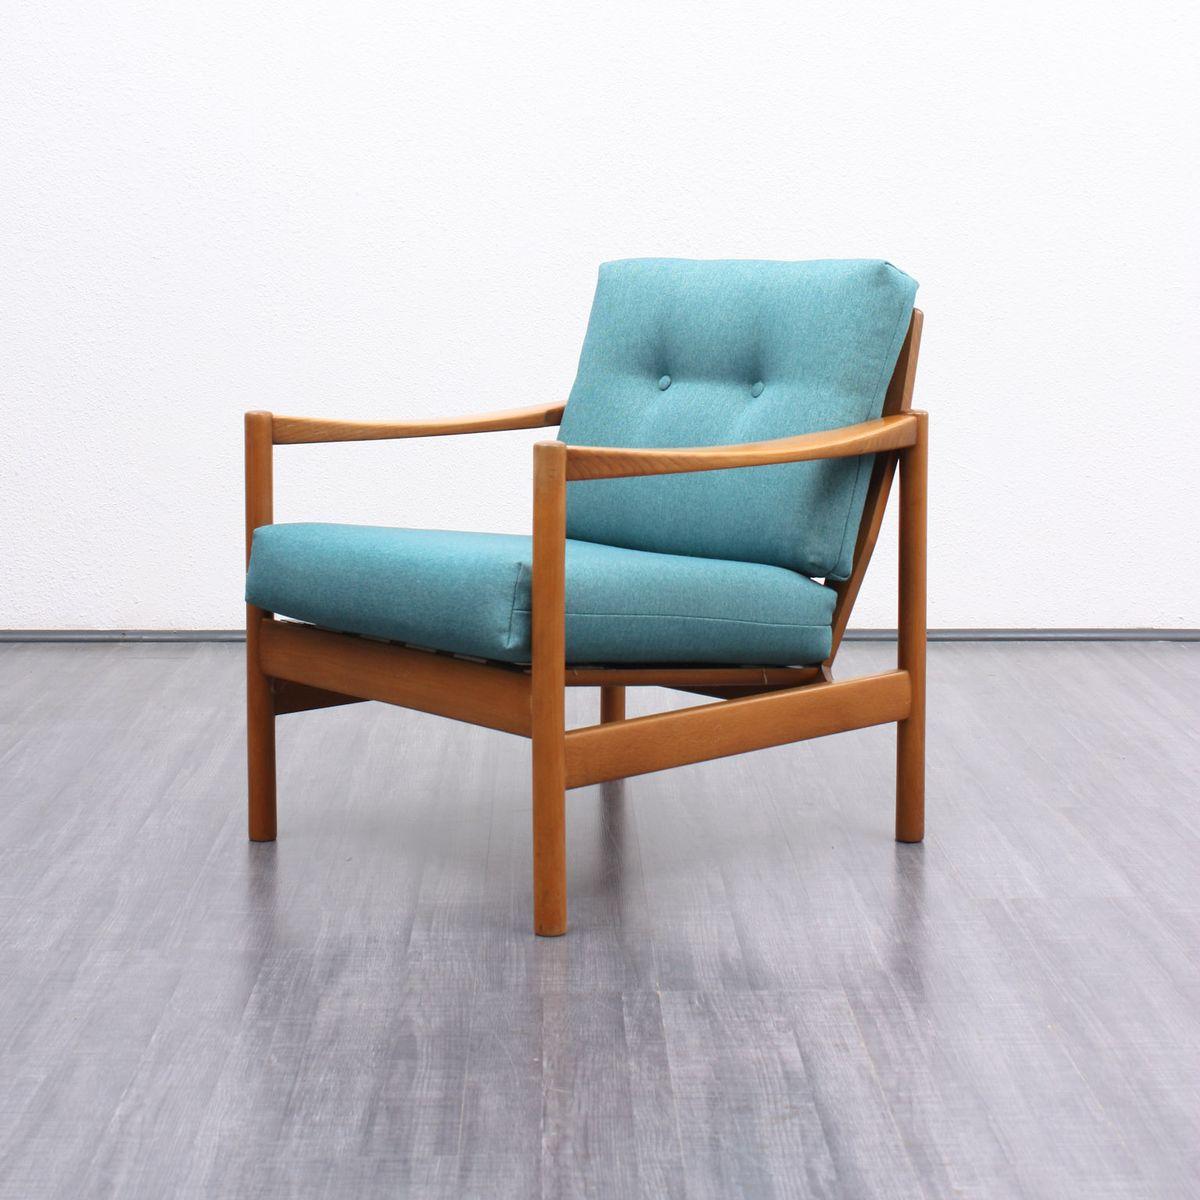 Sessel aus massiver buche 1960er bei pamono kaufen for Suche sessel